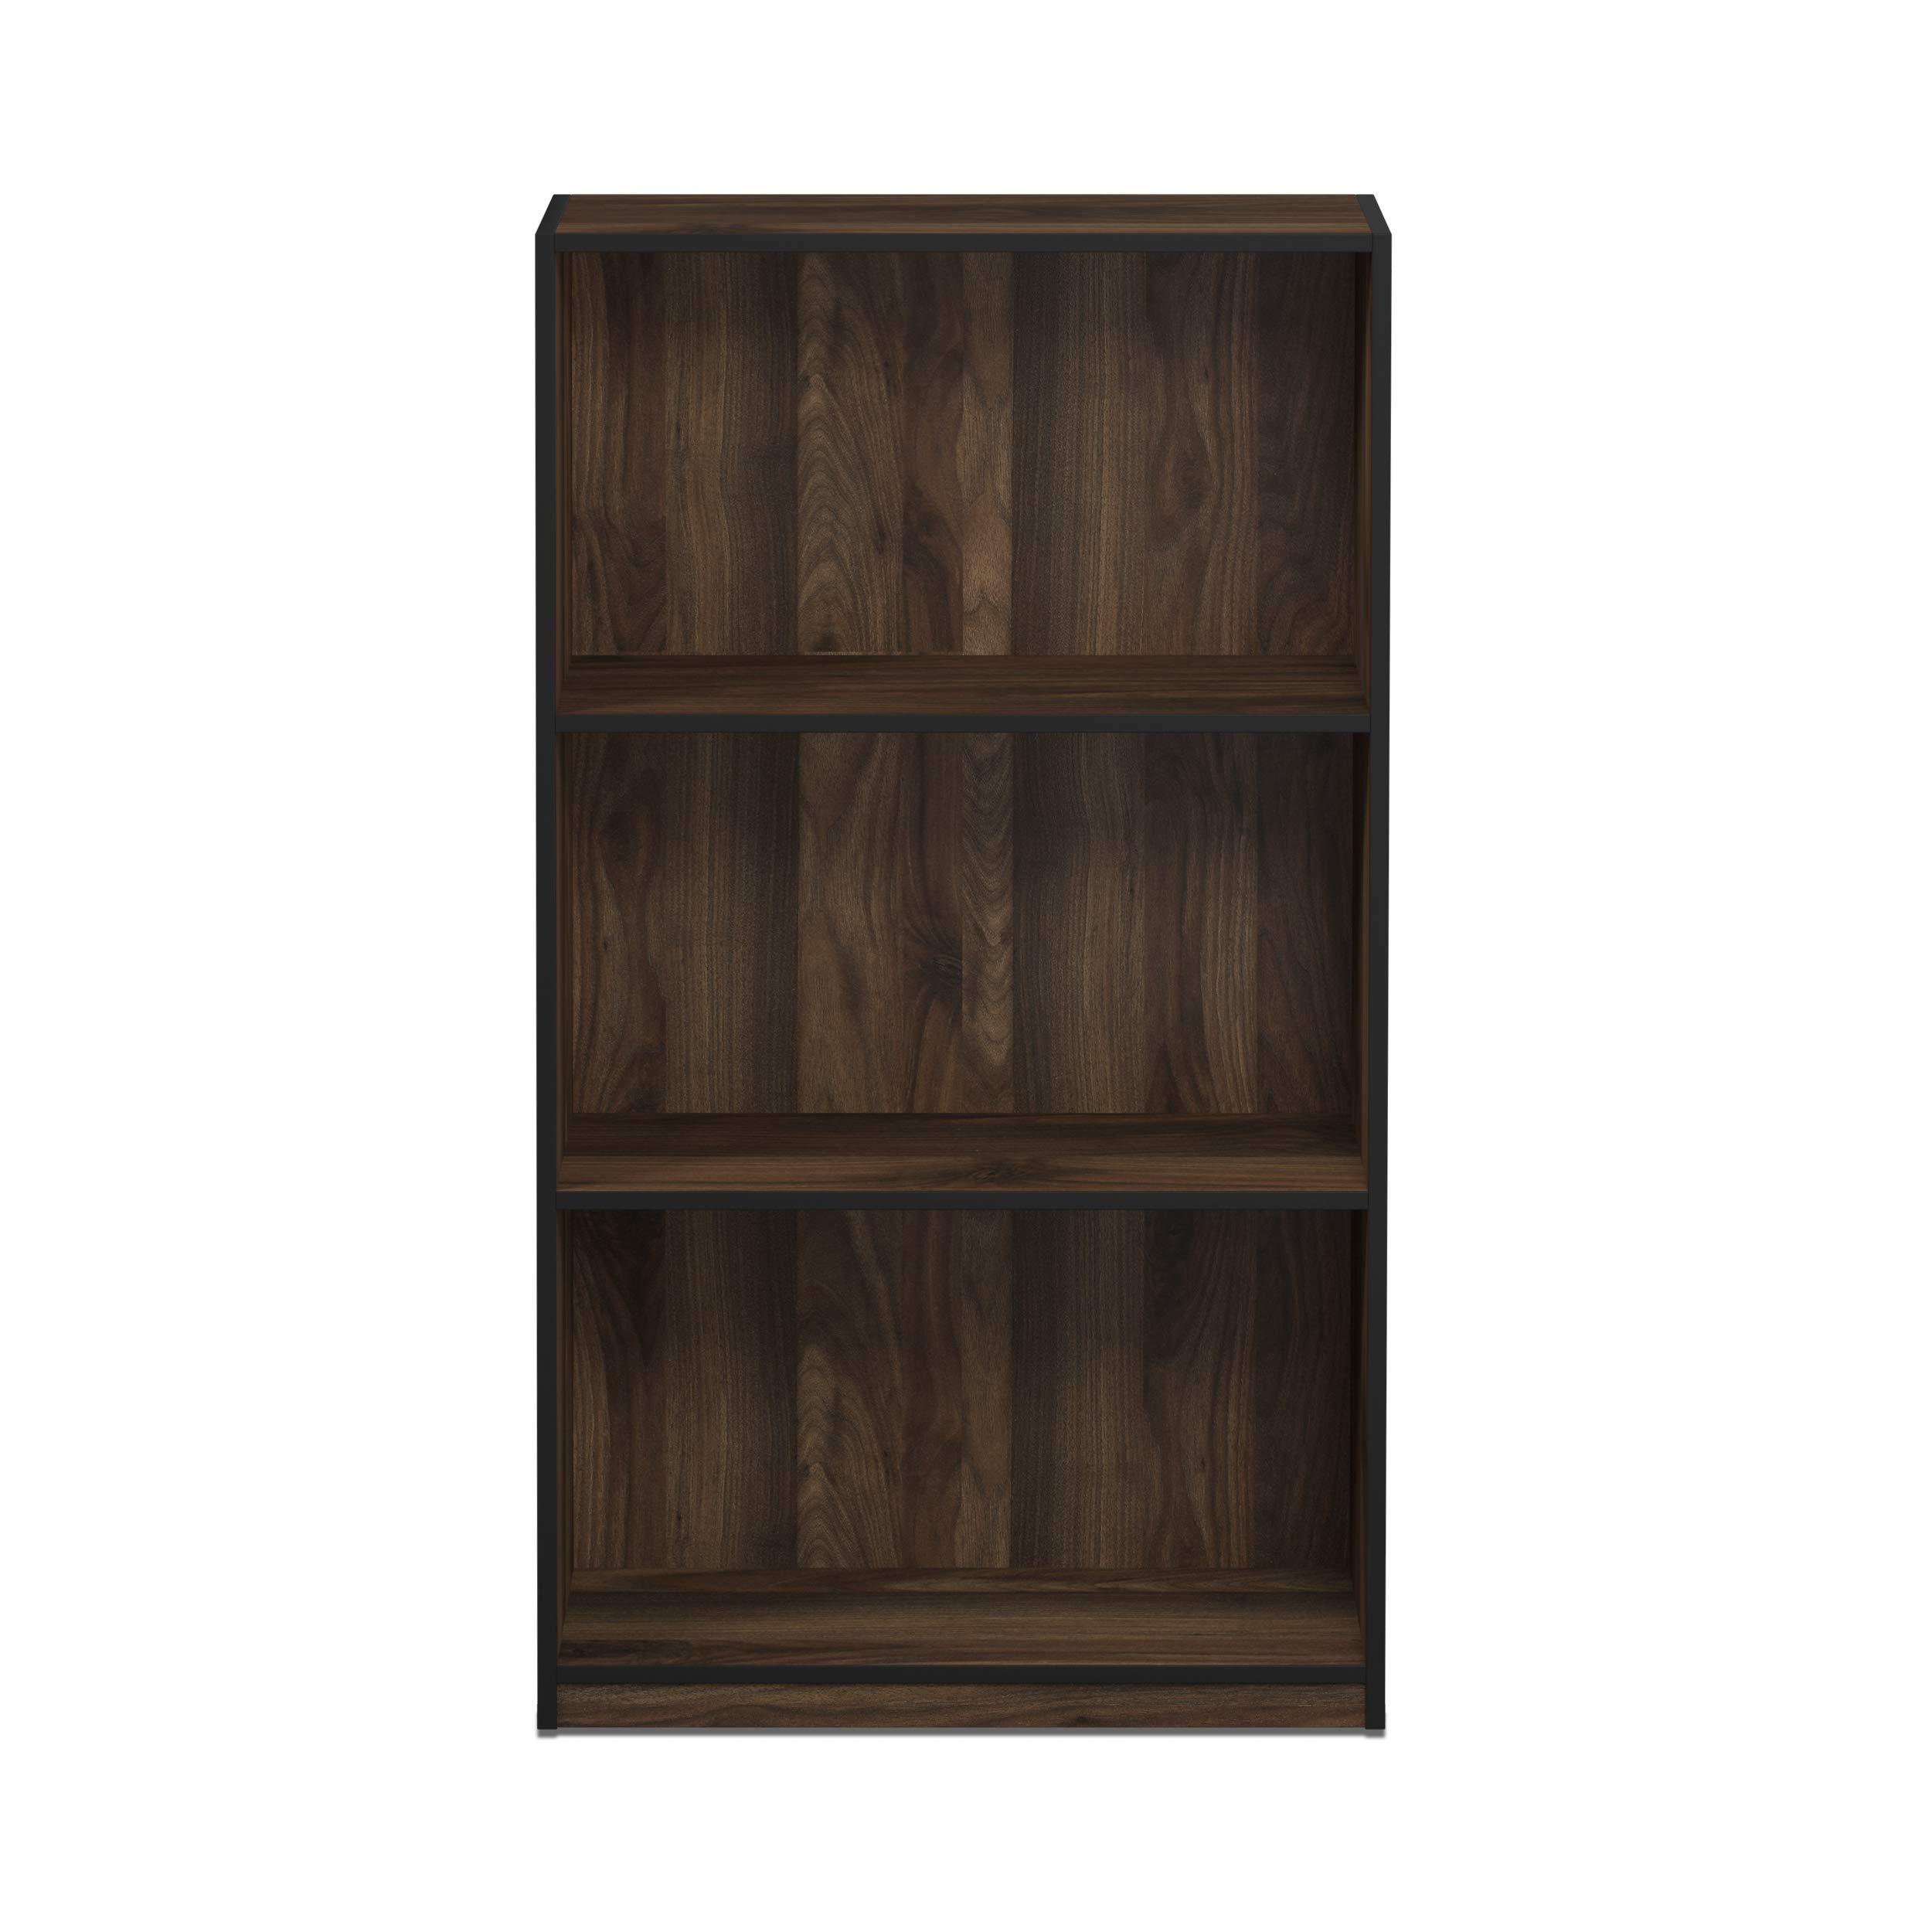 Furinno 99736CWN Basic 3-Tier Bookcase Storage Shelves, Columbia Walnut by Furinno (Image #3)